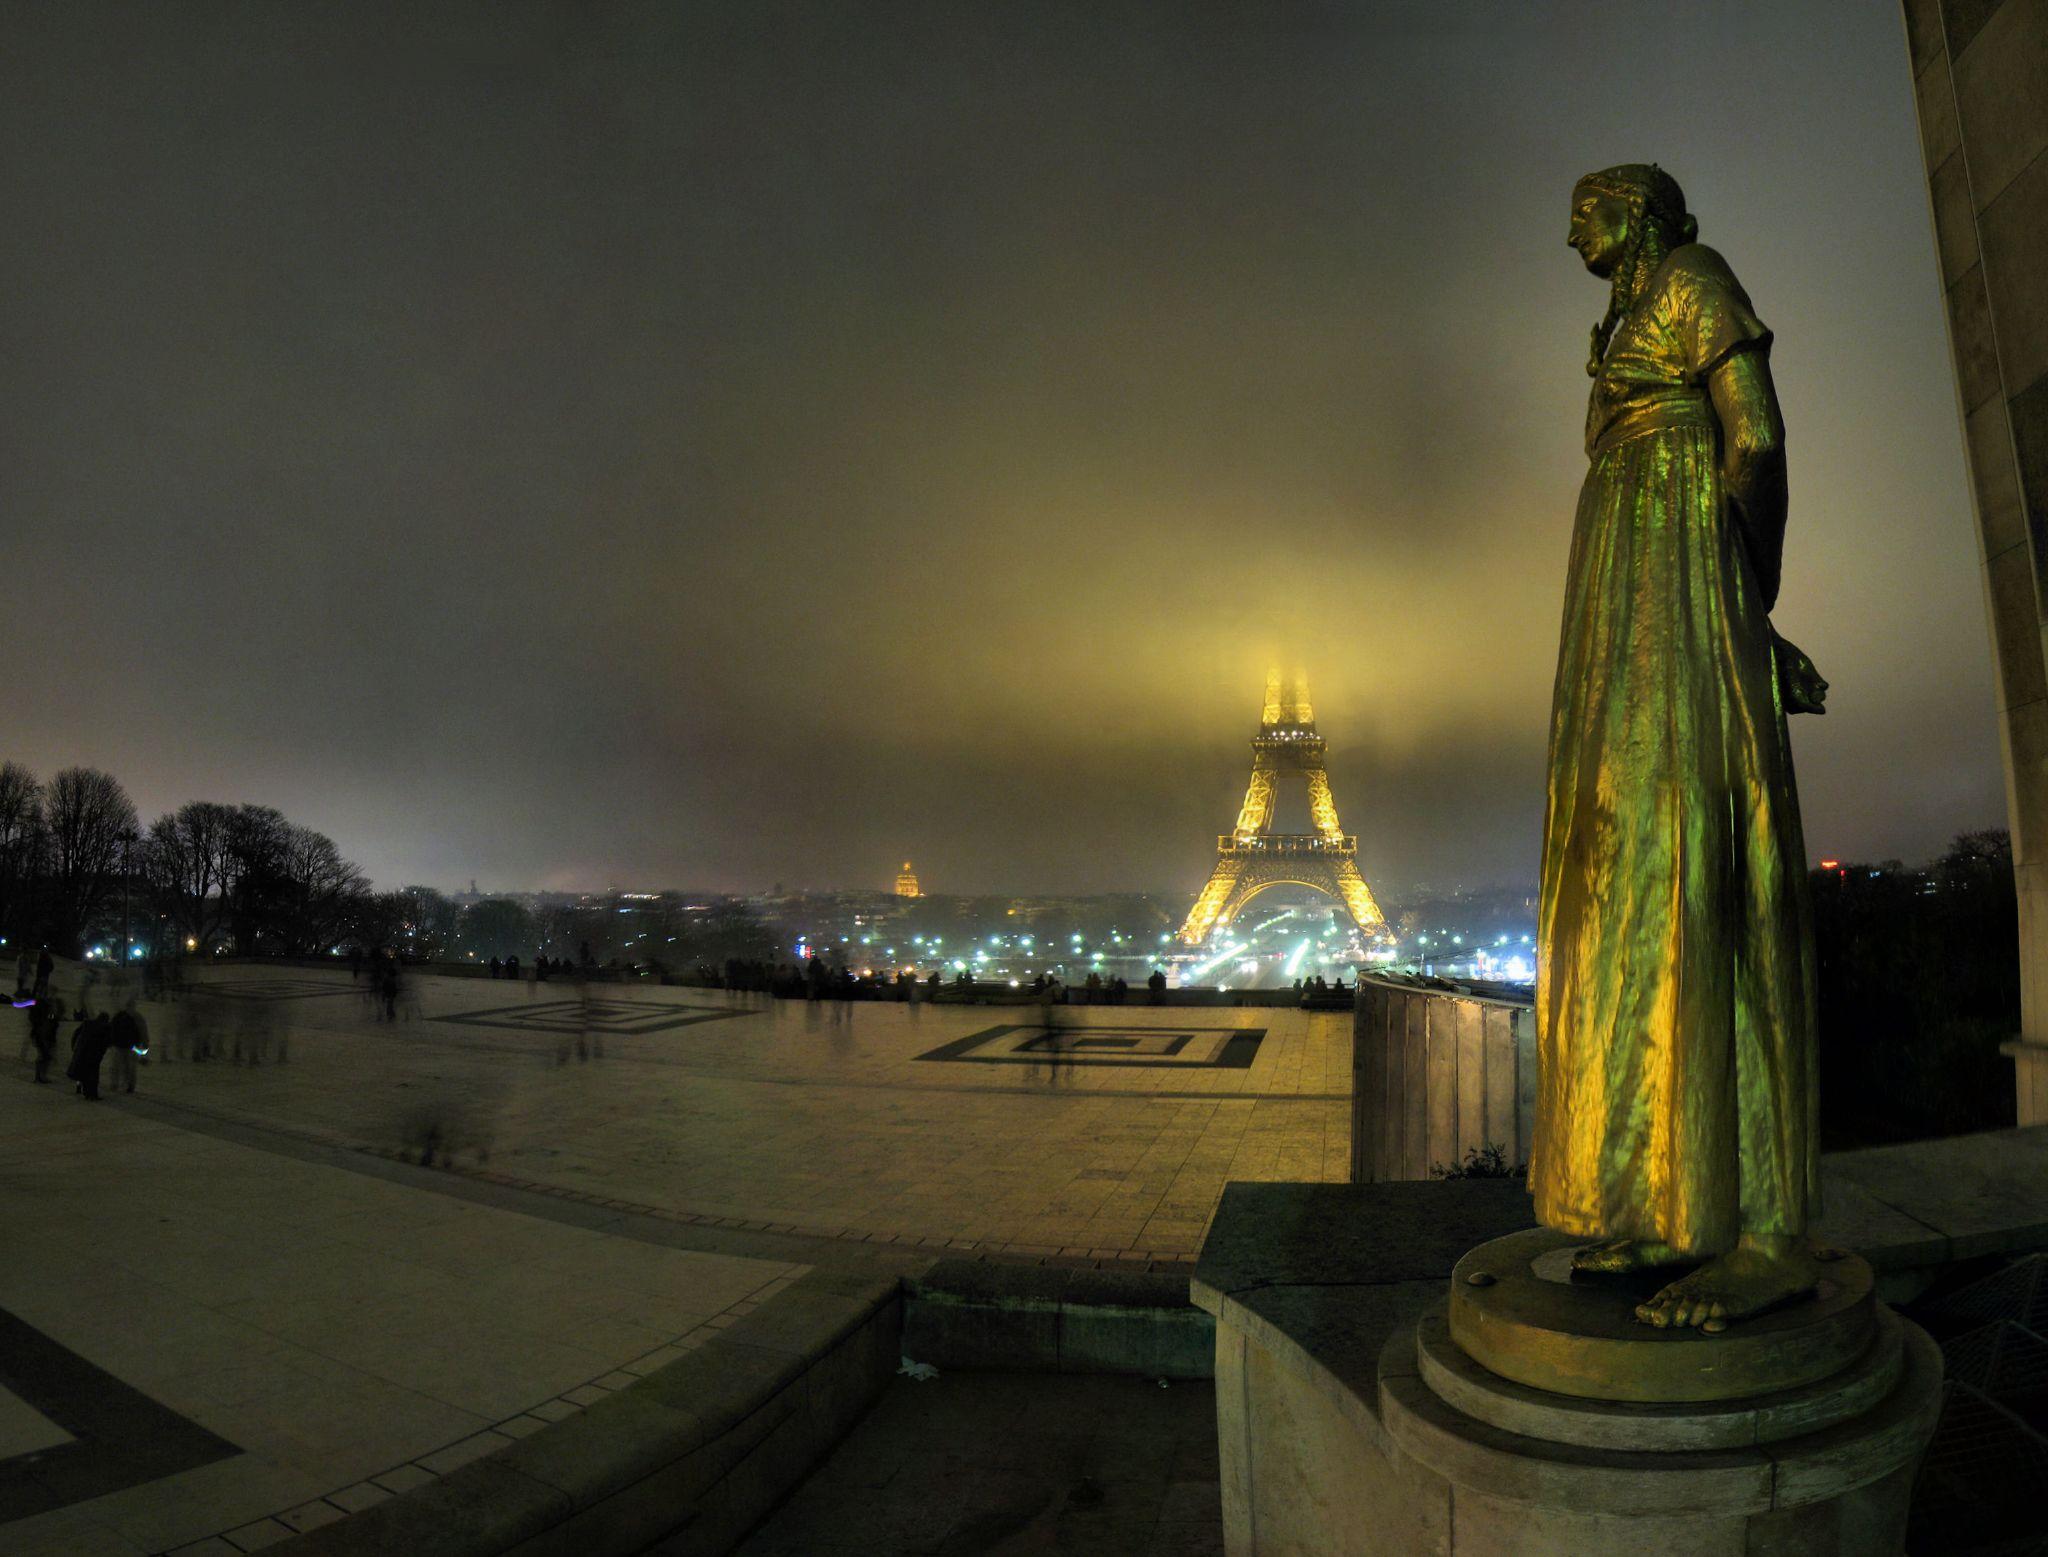 Paris - Trocadéro - 24-12-2007 - 21h33